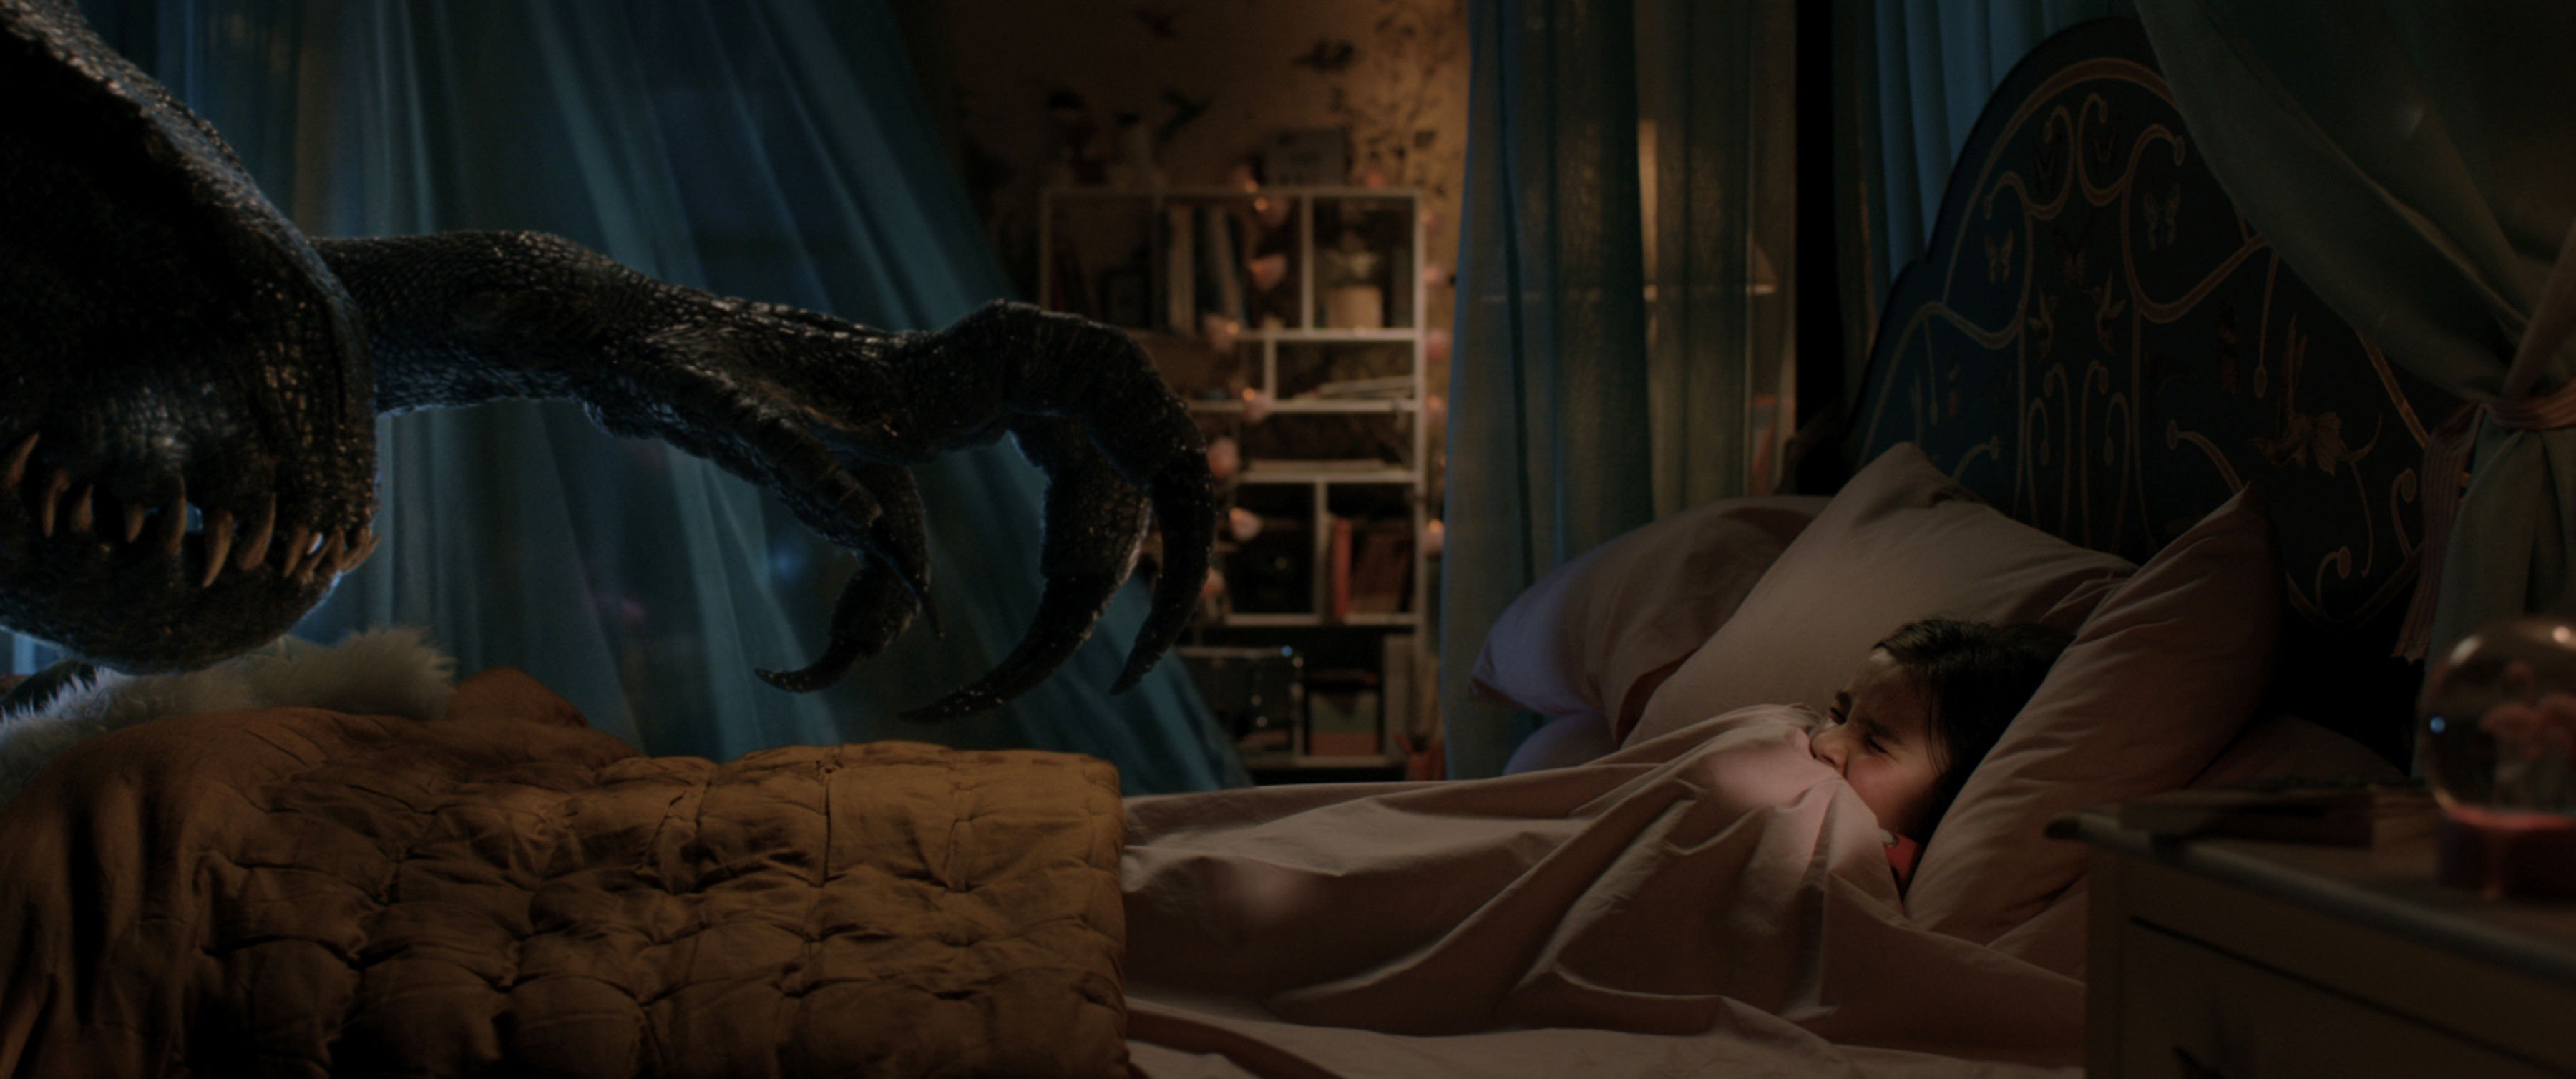 Jurassic World: Fallen Kingdom': How VFX Channeled Classic